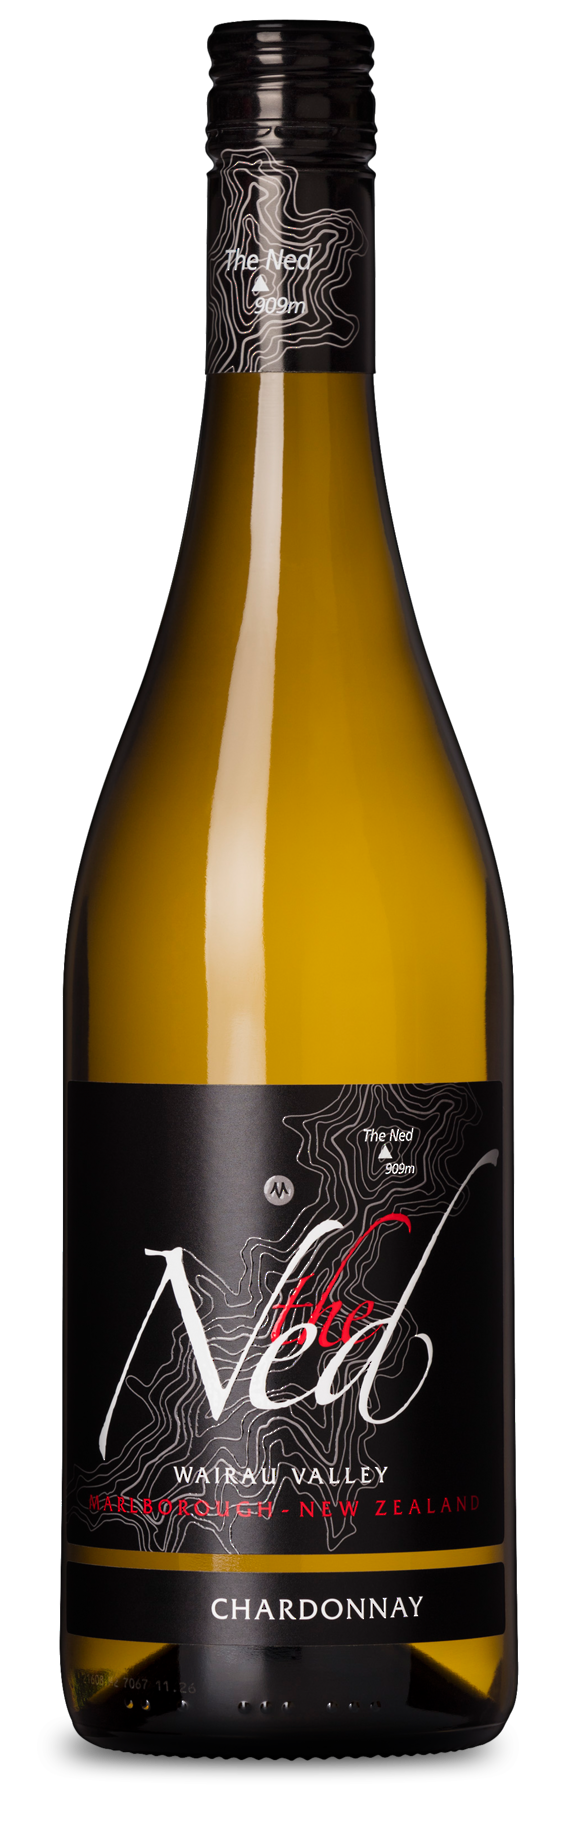 The Ned Chardonnay 2020 image 0